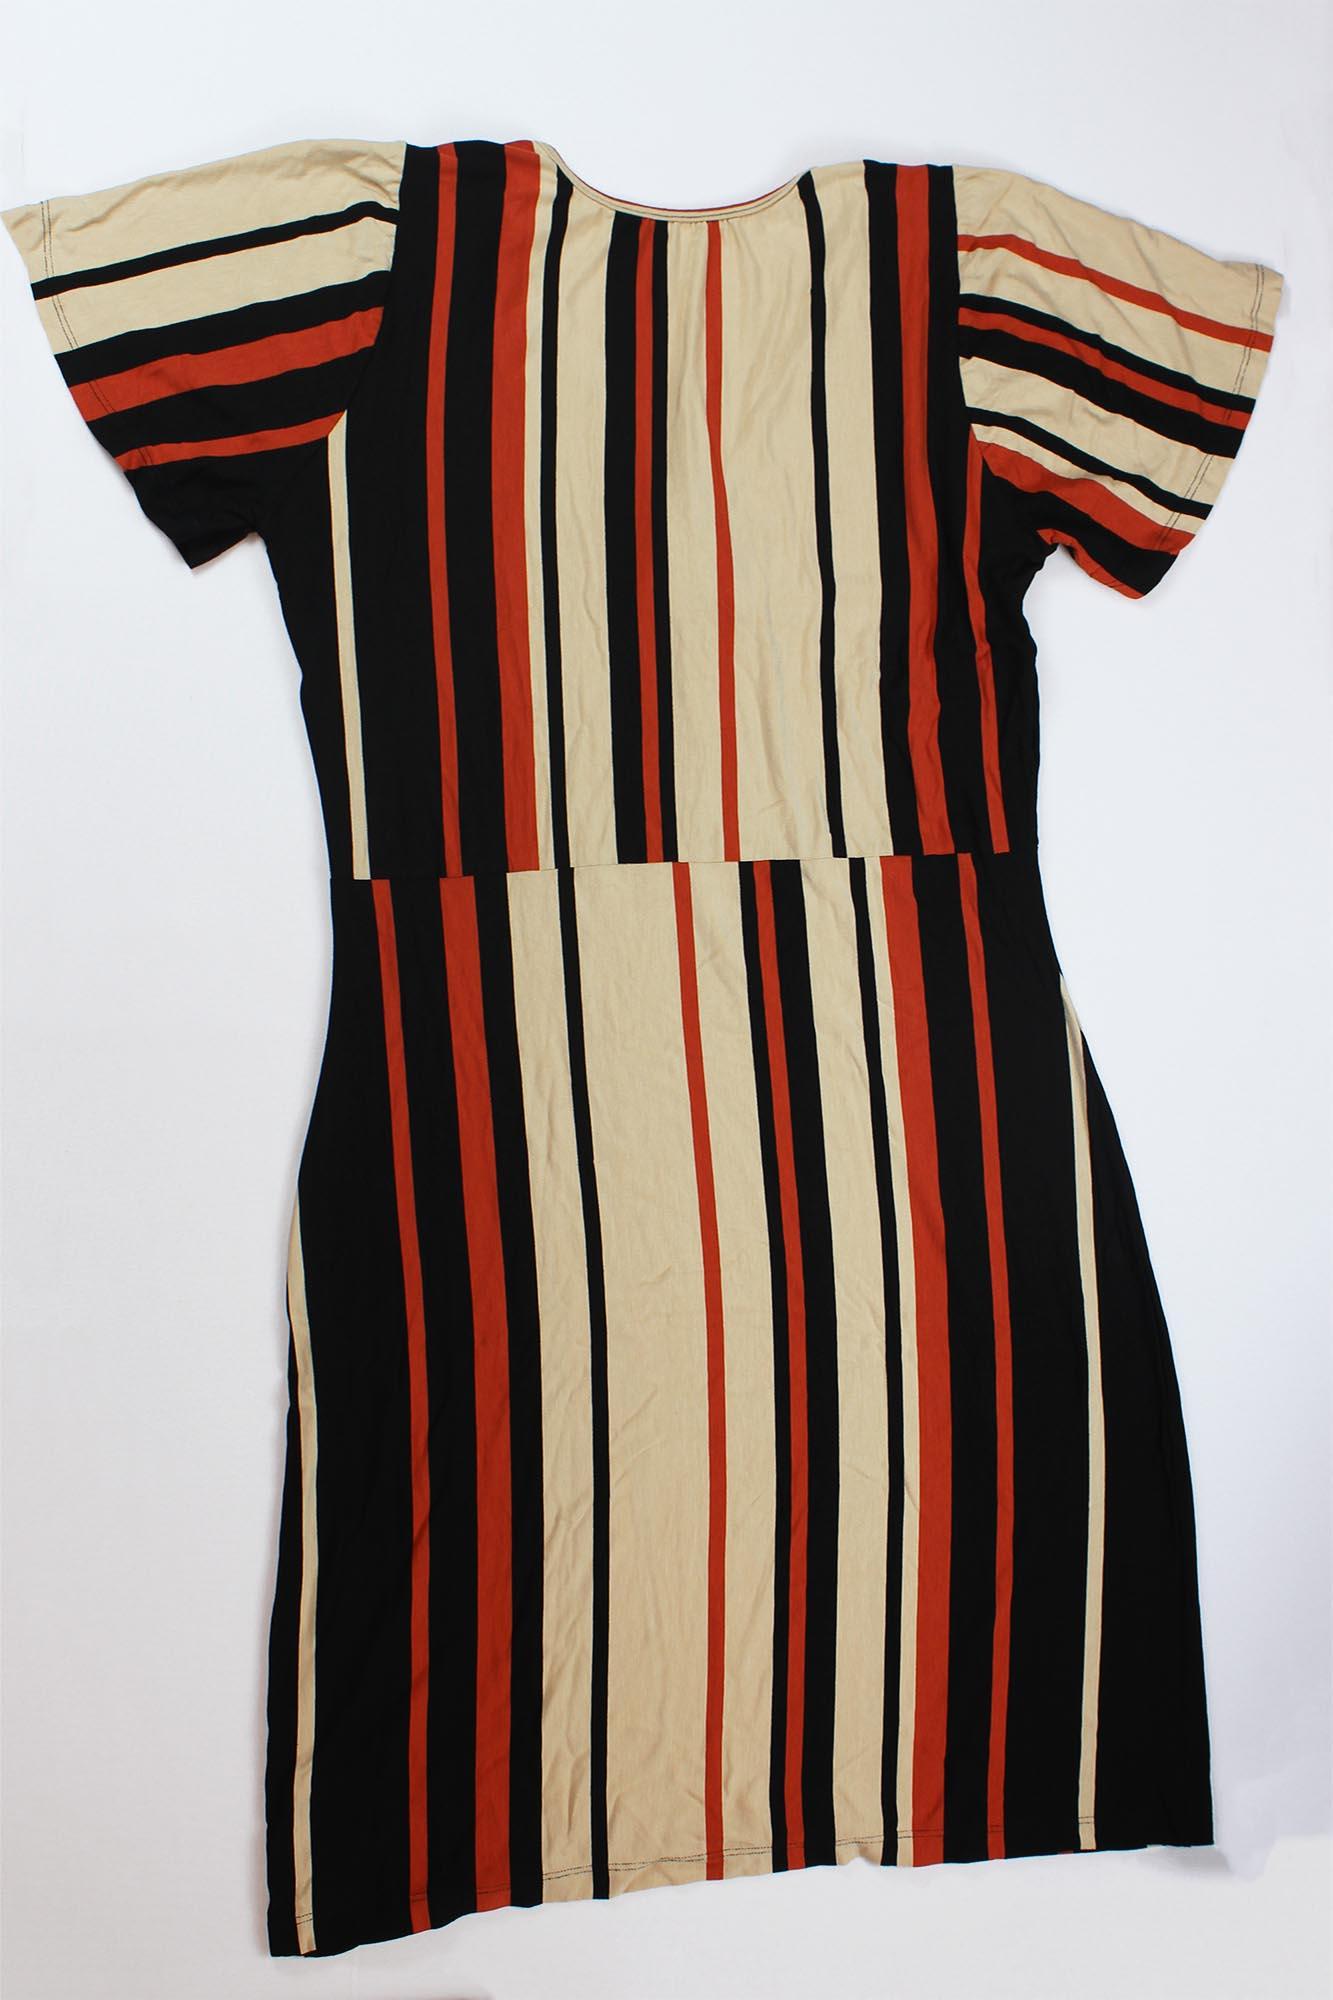 Vestido Curto Listrado Laço Decote Feminino - Preto e Terracota